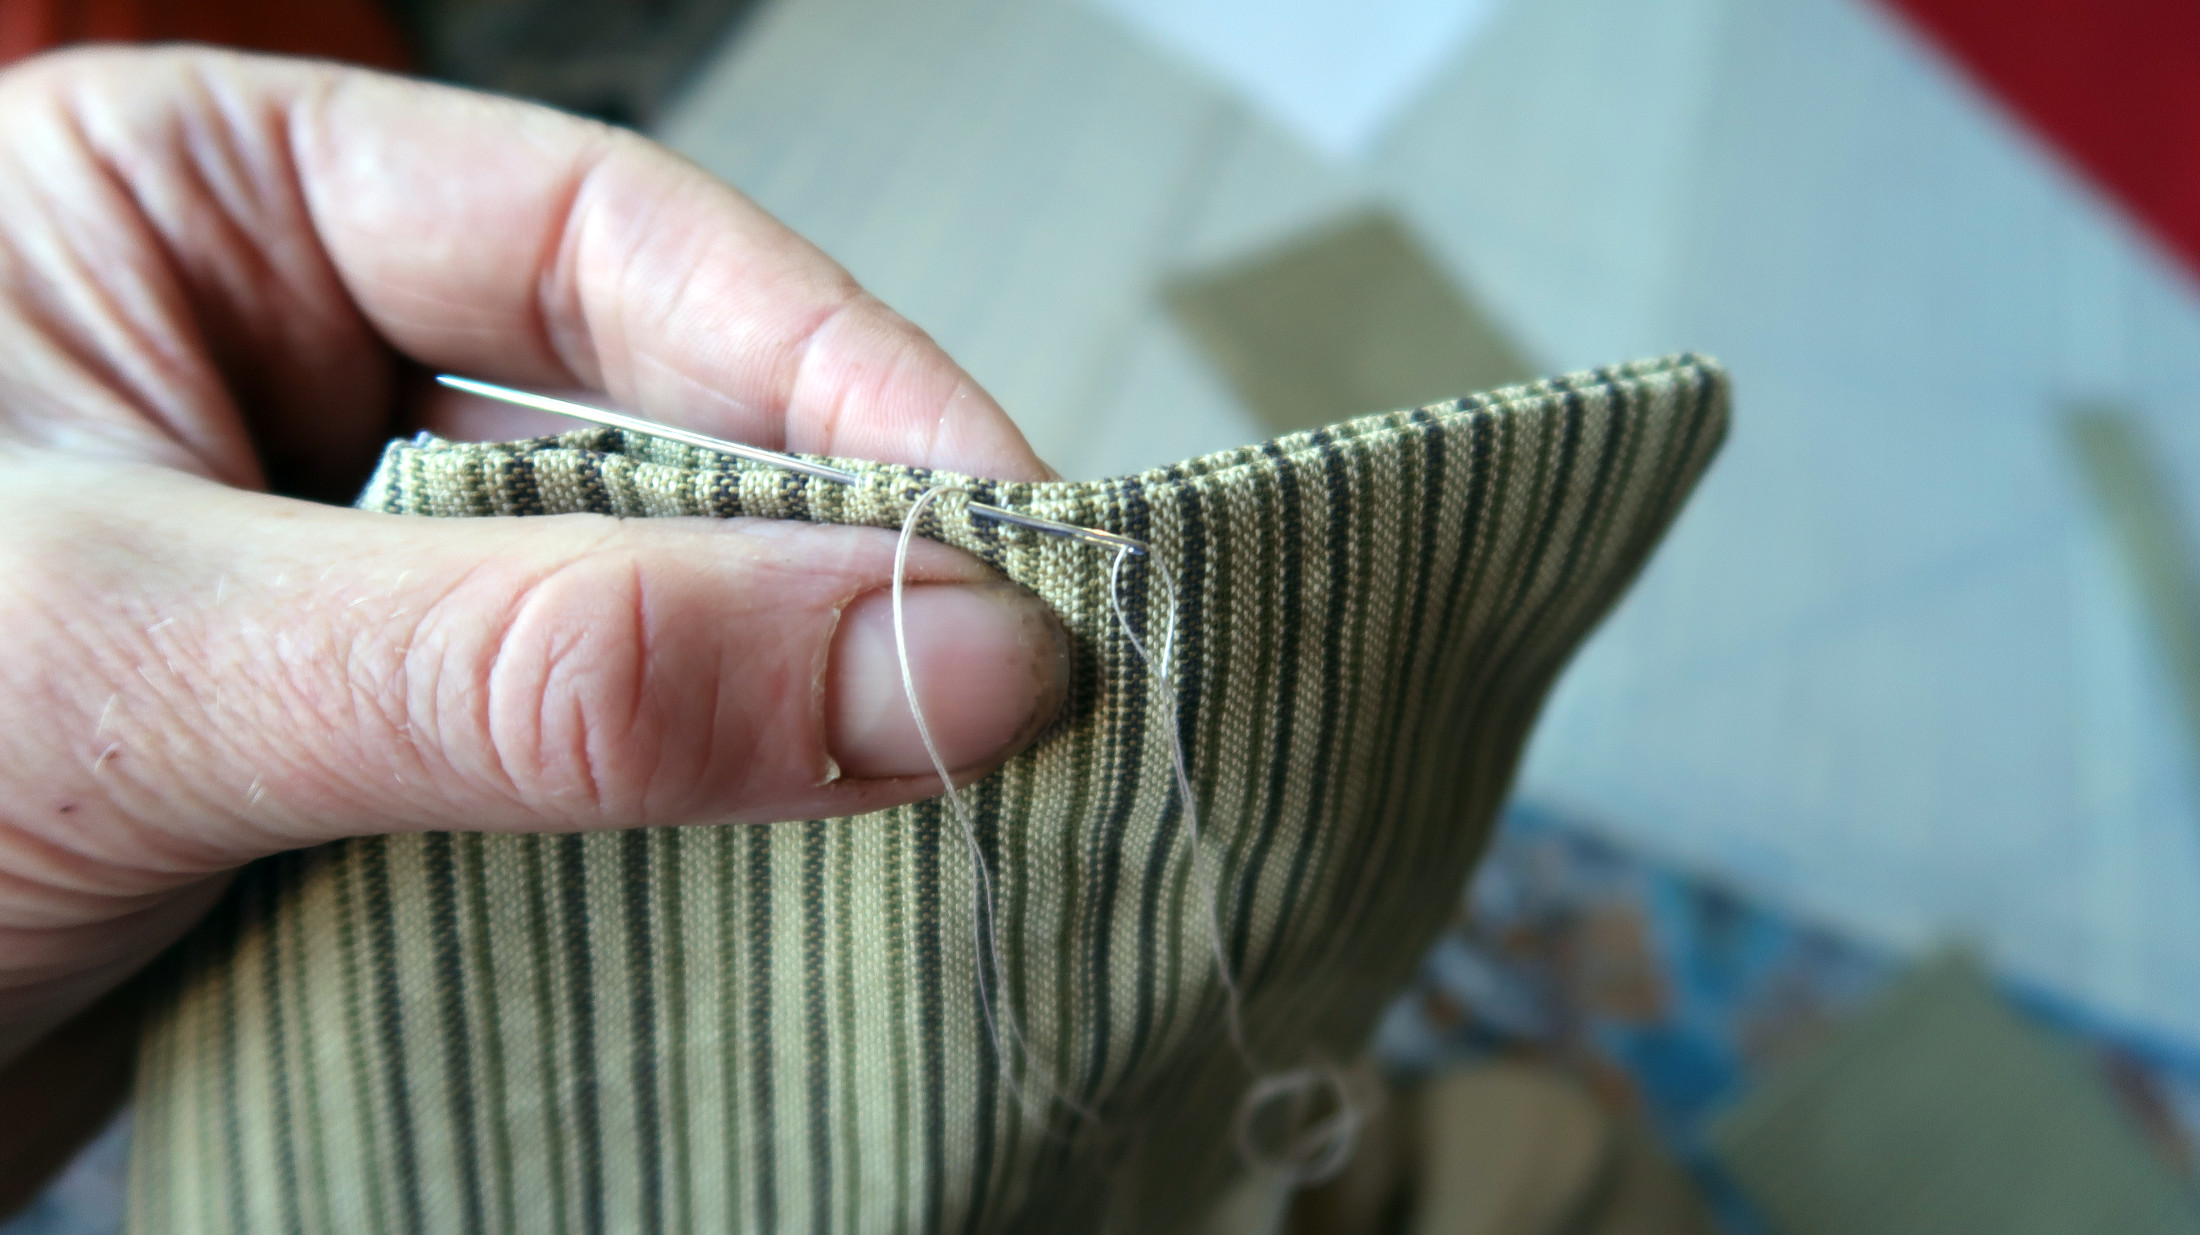 Straps: sewing end shut